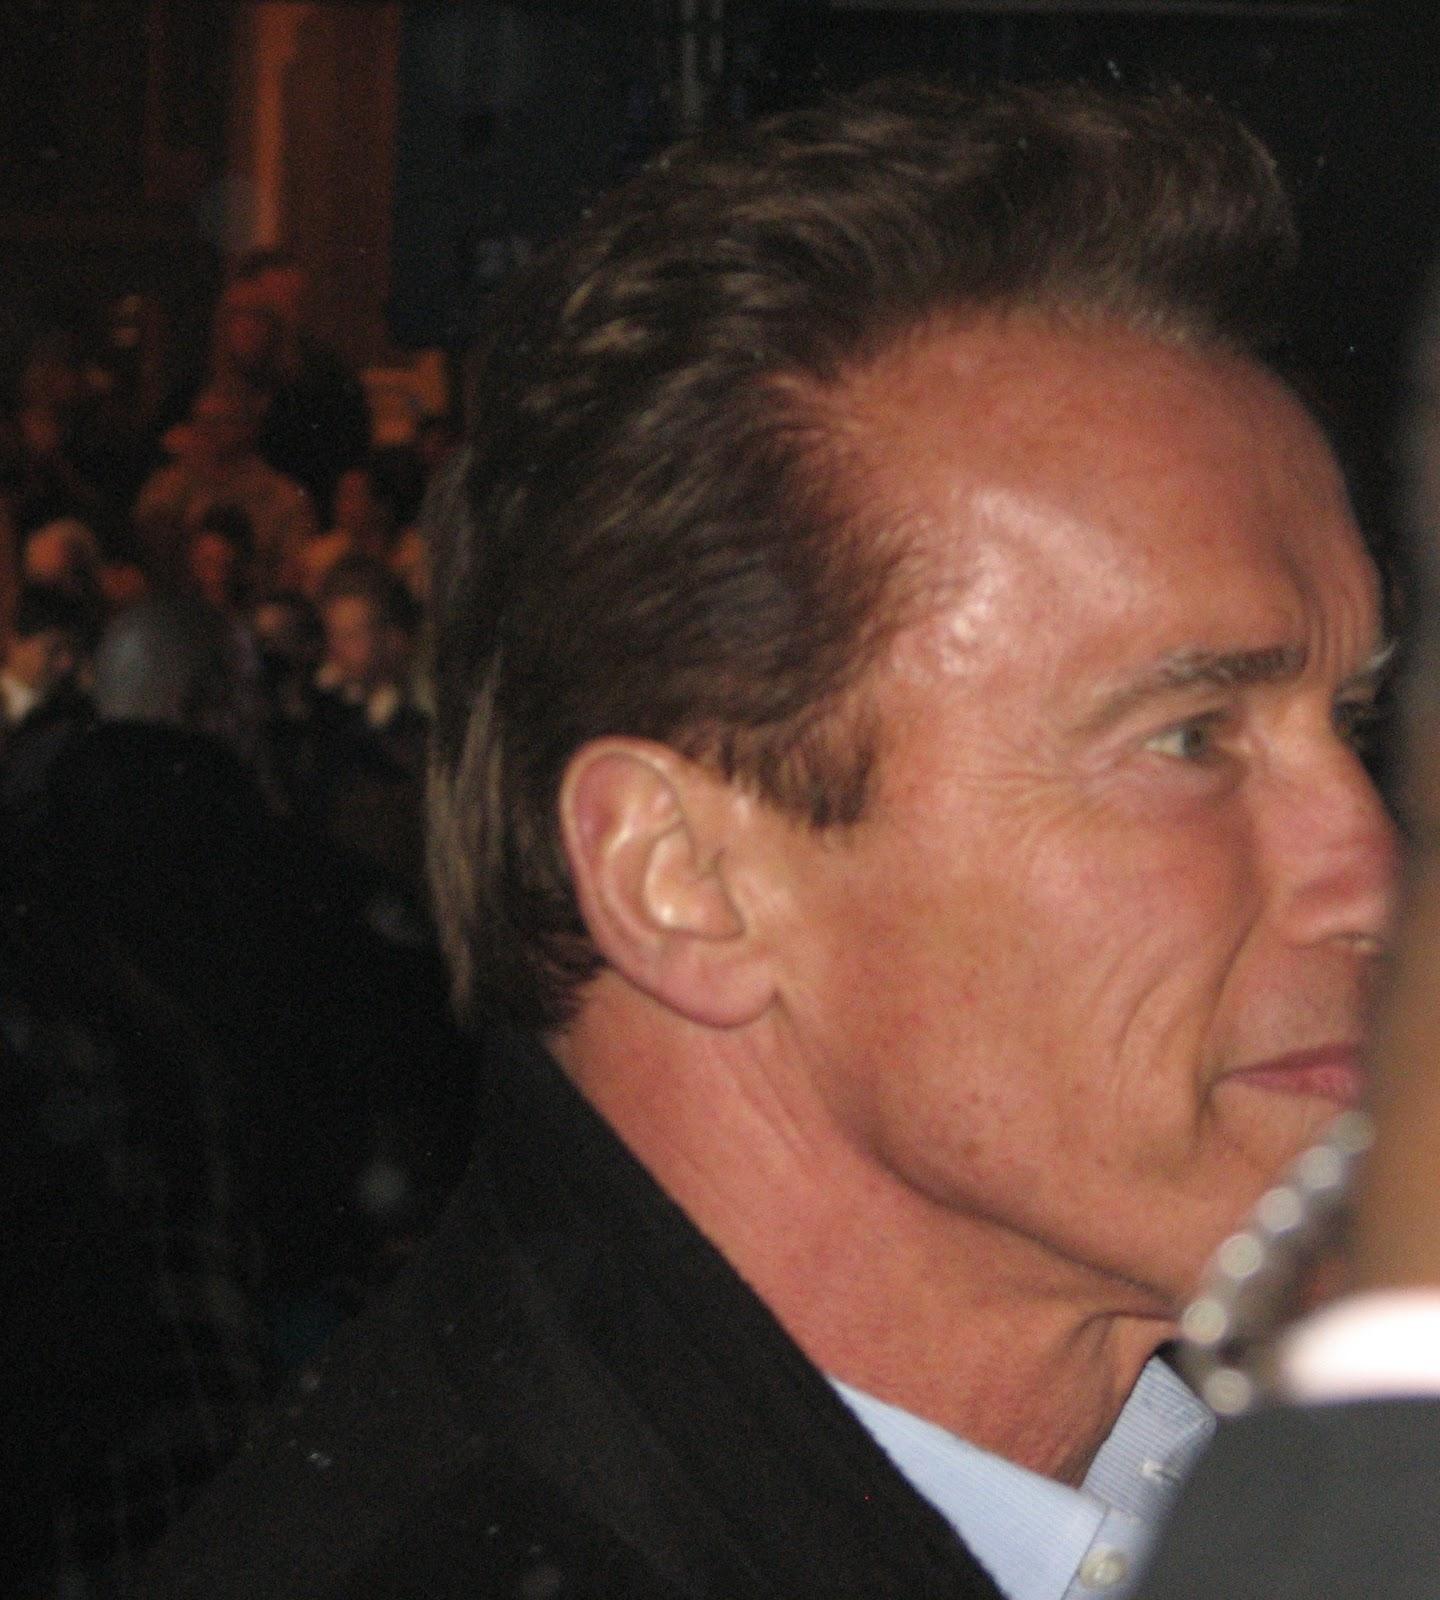 http://1.bp.blogspot.com/_LQQ5FS2UDbY/TOoZxf6yeTI/AAAAAAAADDk/R-4b7LhYz2k/s1600/Arnold+Alois+Schwarzenegger.jpg